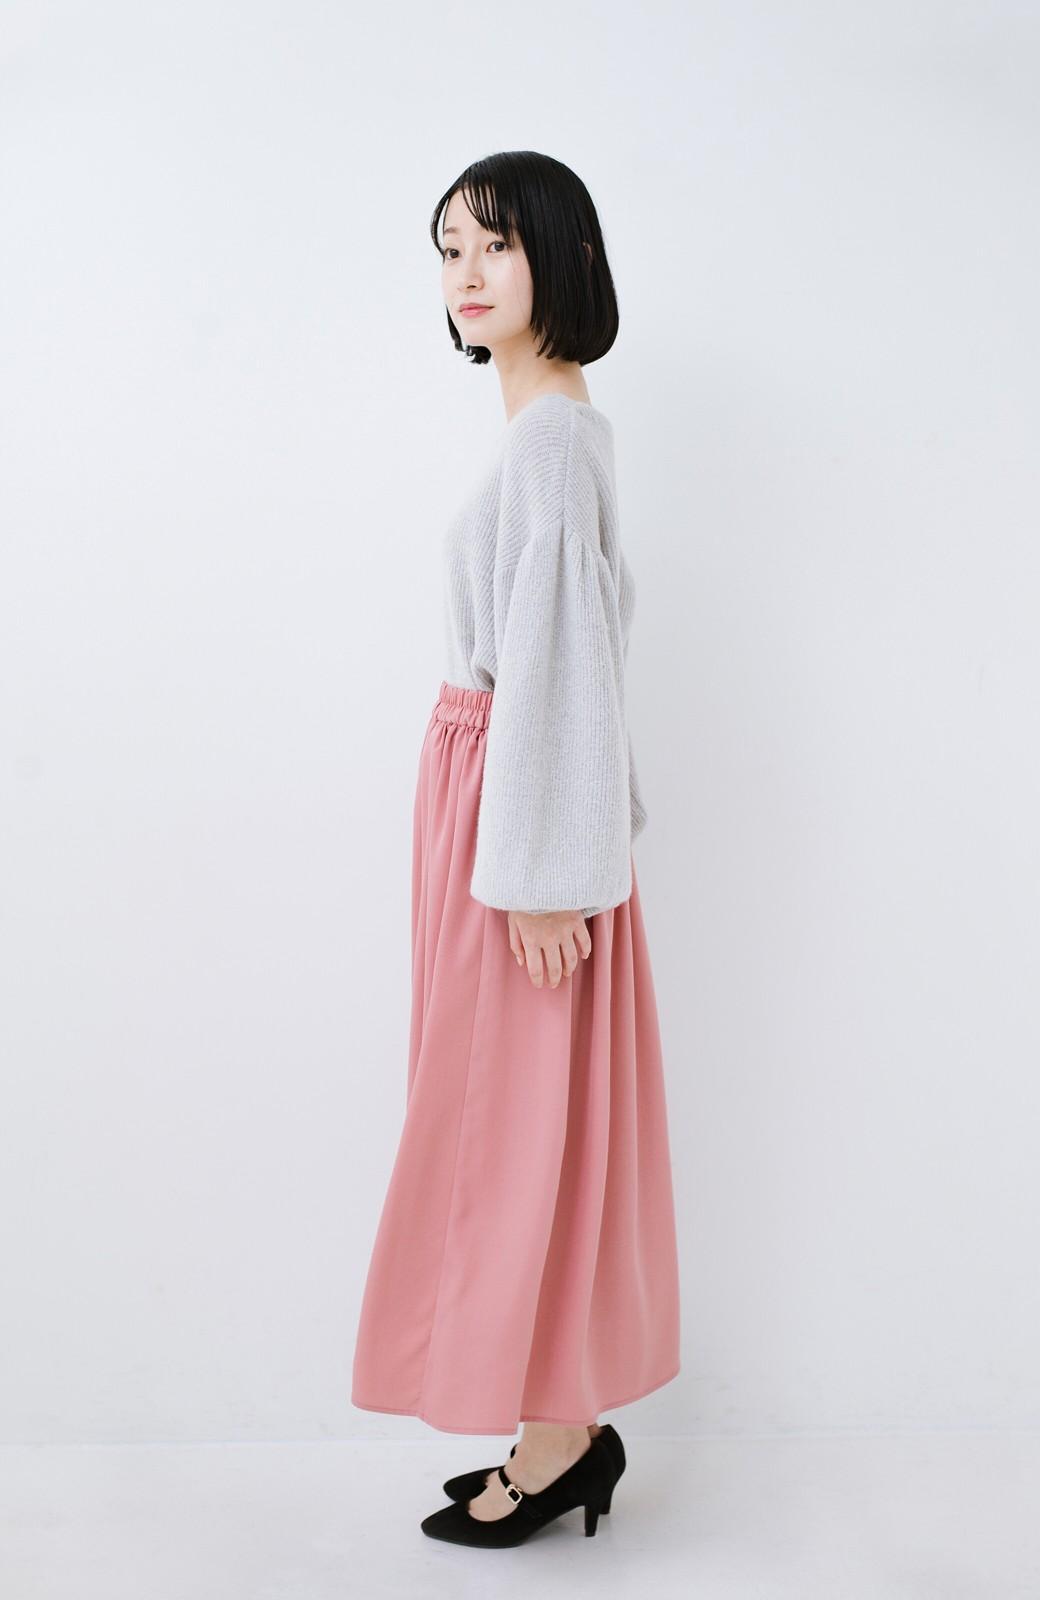 haco! きれいなお姉さんになれる気がするミモレ丈フレアースカート <ピンク>の商品写真12